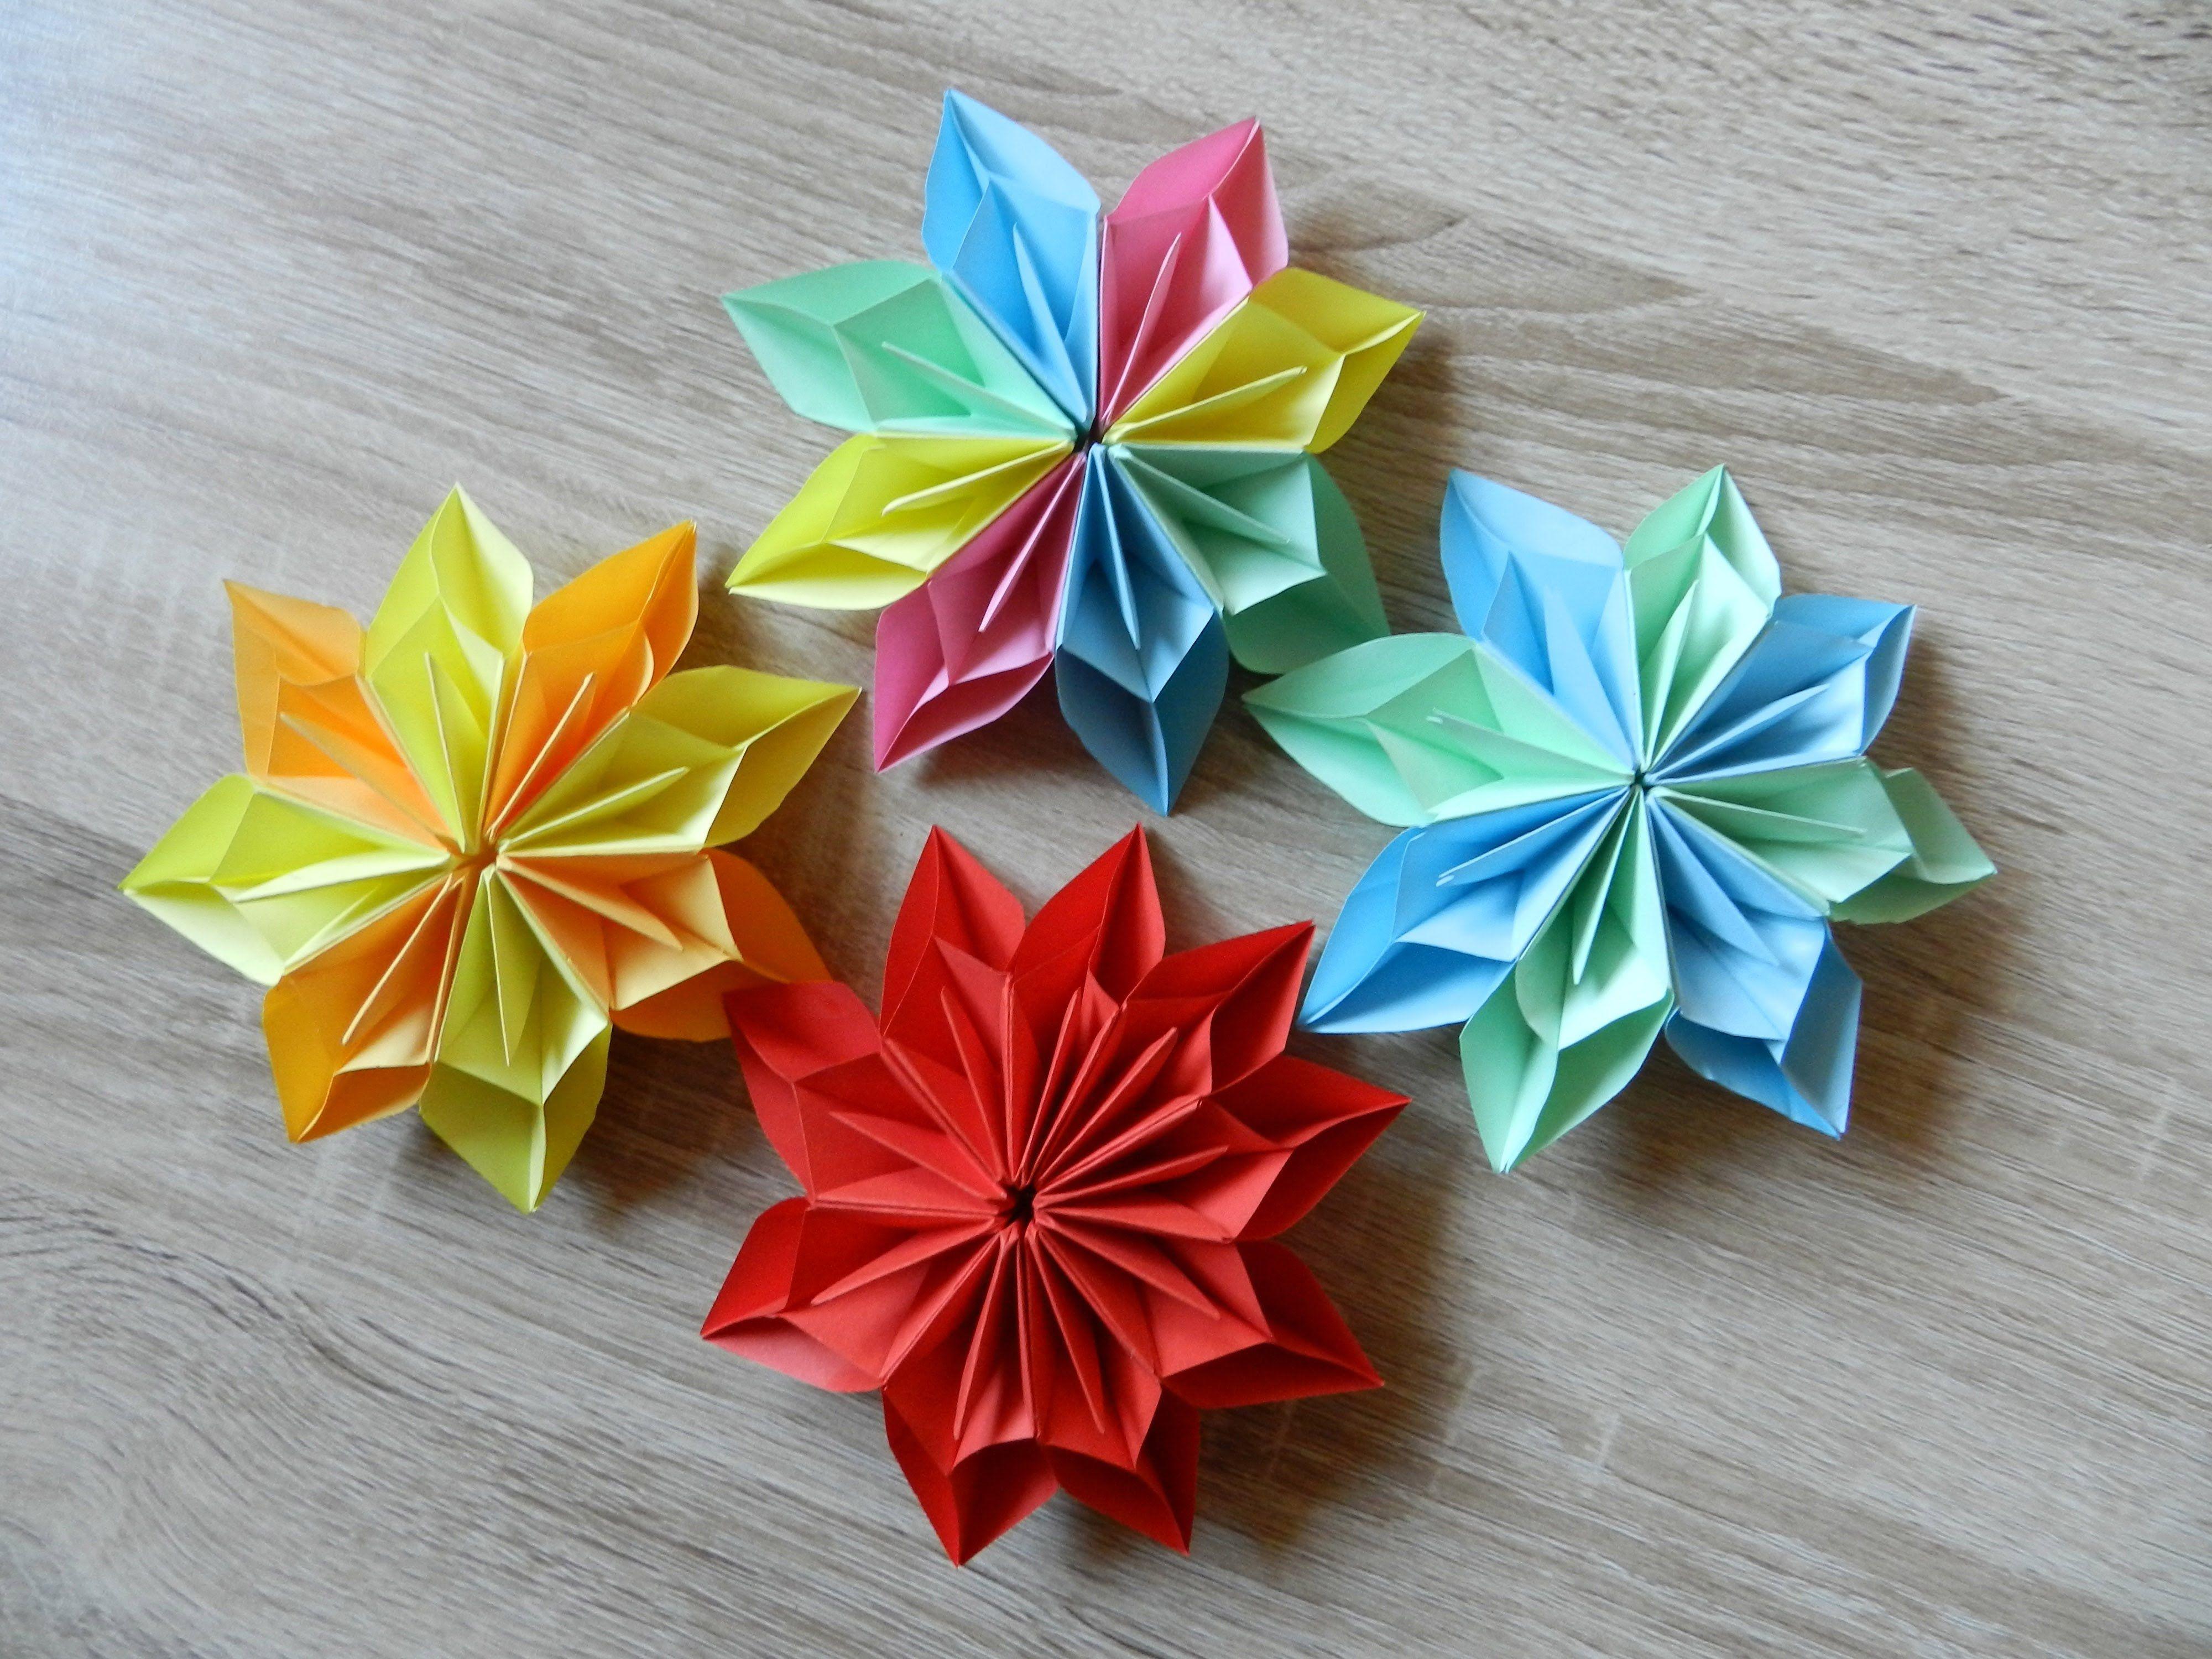 Origami Blume Falten/ DIY Origami Flower